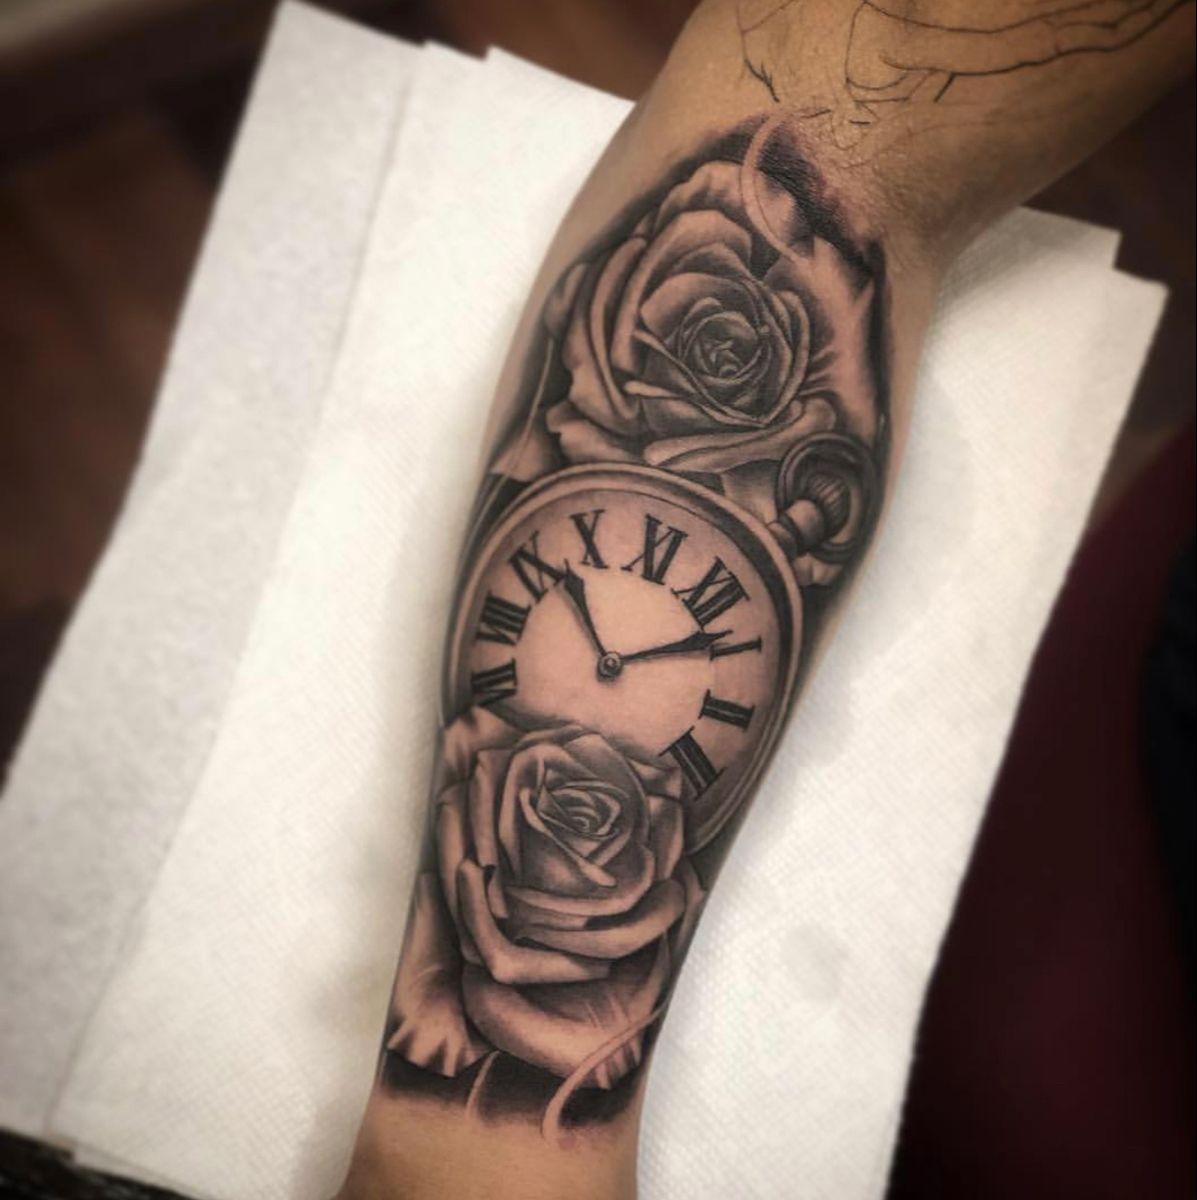 #sleeve #tattoo #tattooideas #tattooartist #tattooart #romannumerals #rose #rosetatto #clocktattoosleeve #explore